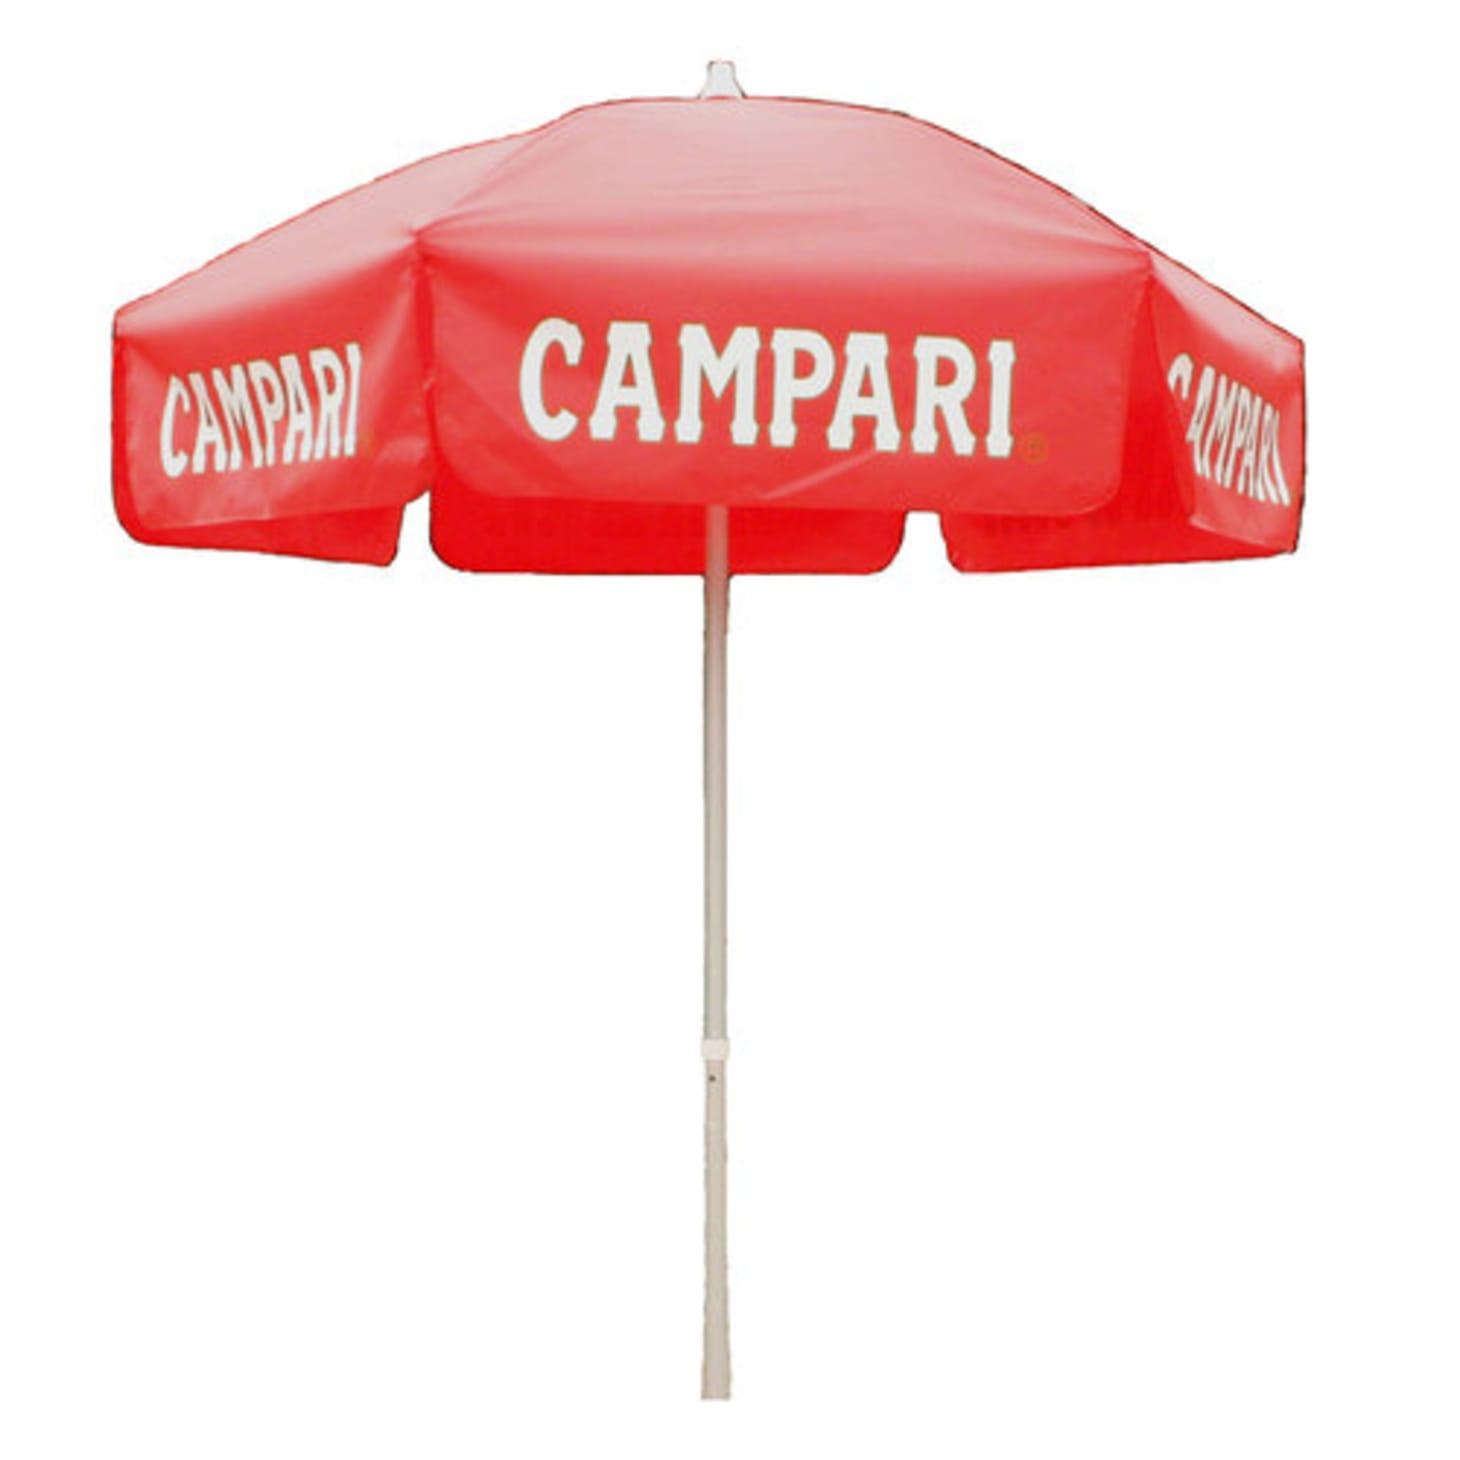 Best Market Umbrellas: IKEA, Dayva, RH, Curran & 11 More